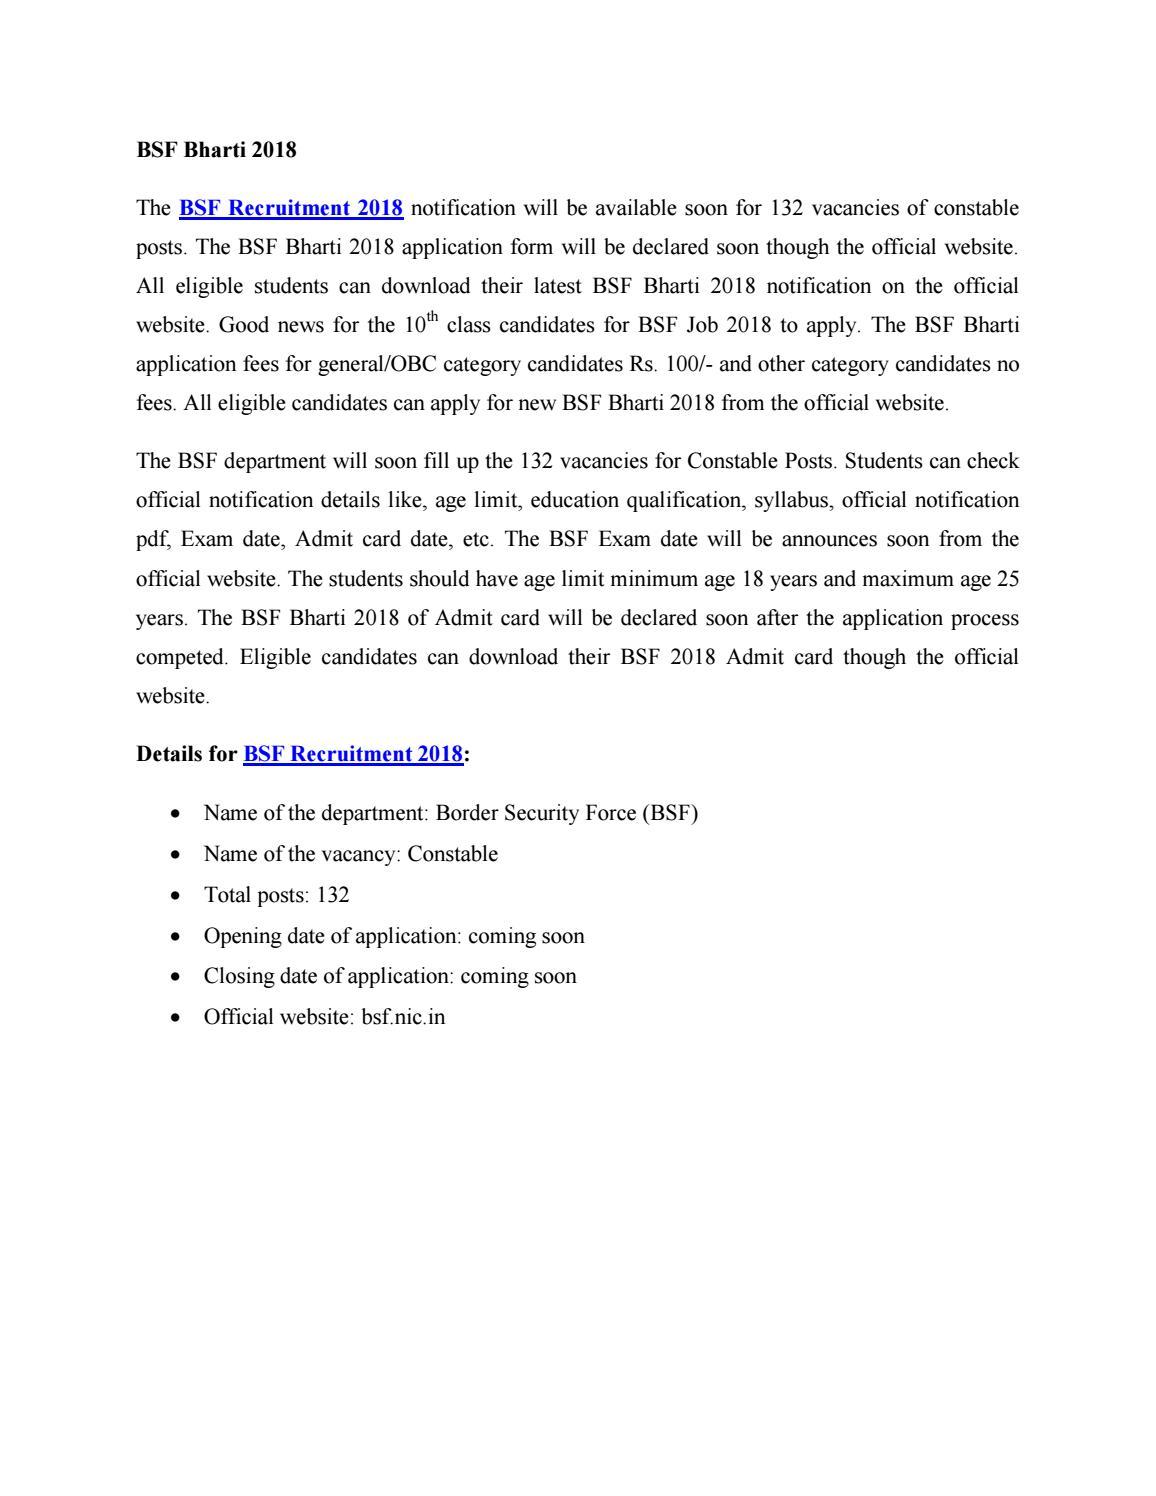 Bsf Recruitment 2015 Application Form Pdf